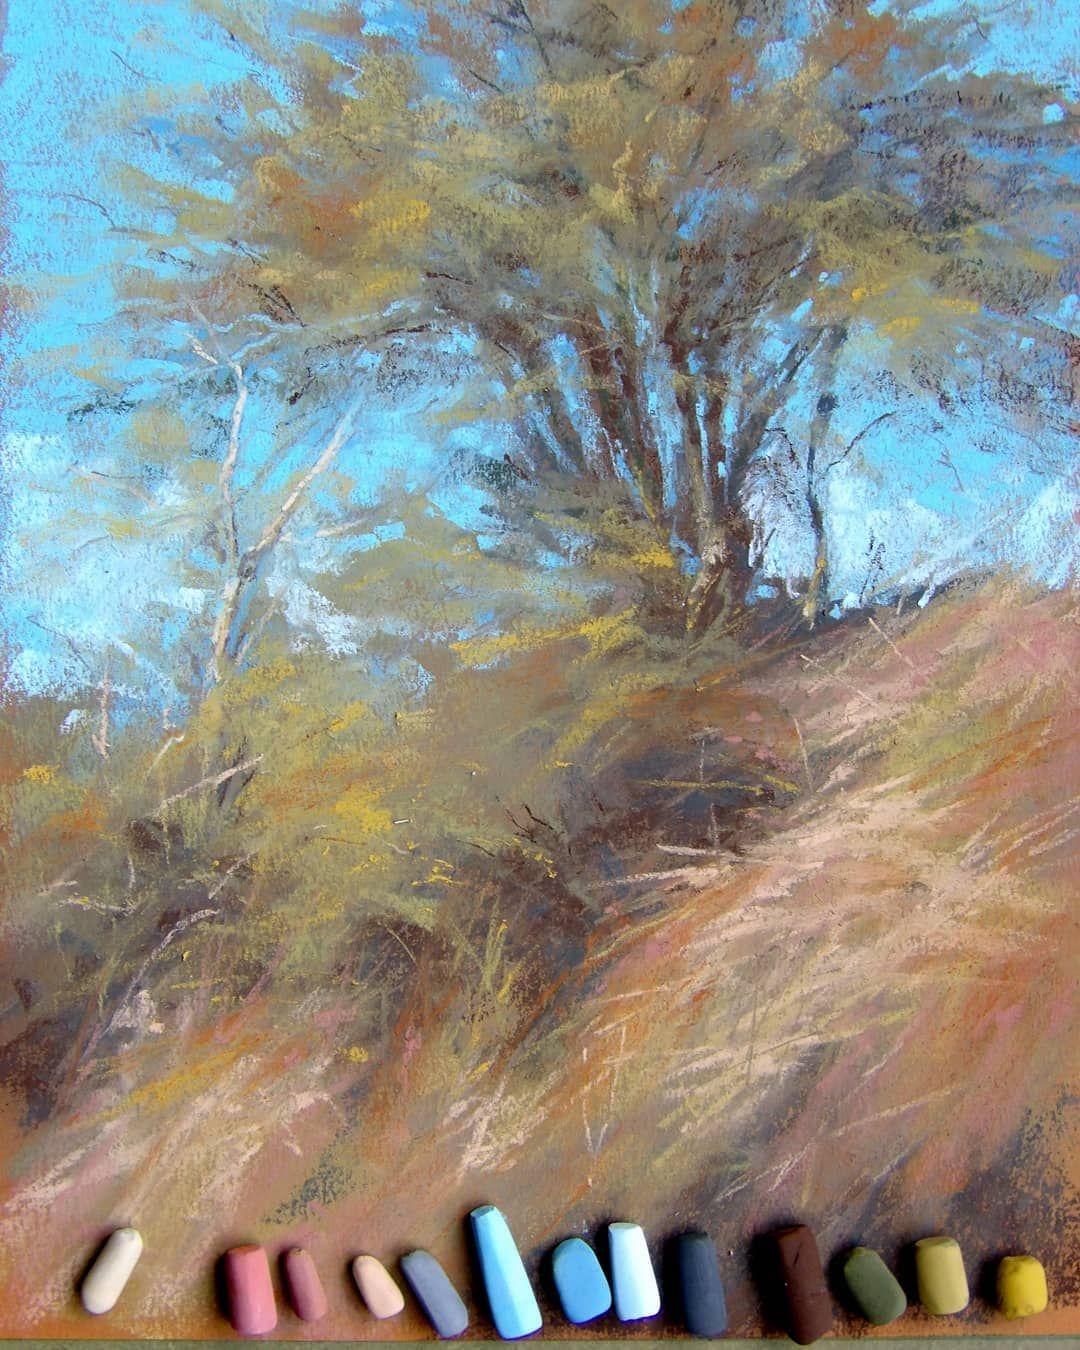 Alan Chaney On Instagram Pastel Sketch 23 X 31cm Landscape Landscapepainting Pastel Pastelpainting Eif Pastel Graphic Art Oil Pastel Art Soft Pastel Art